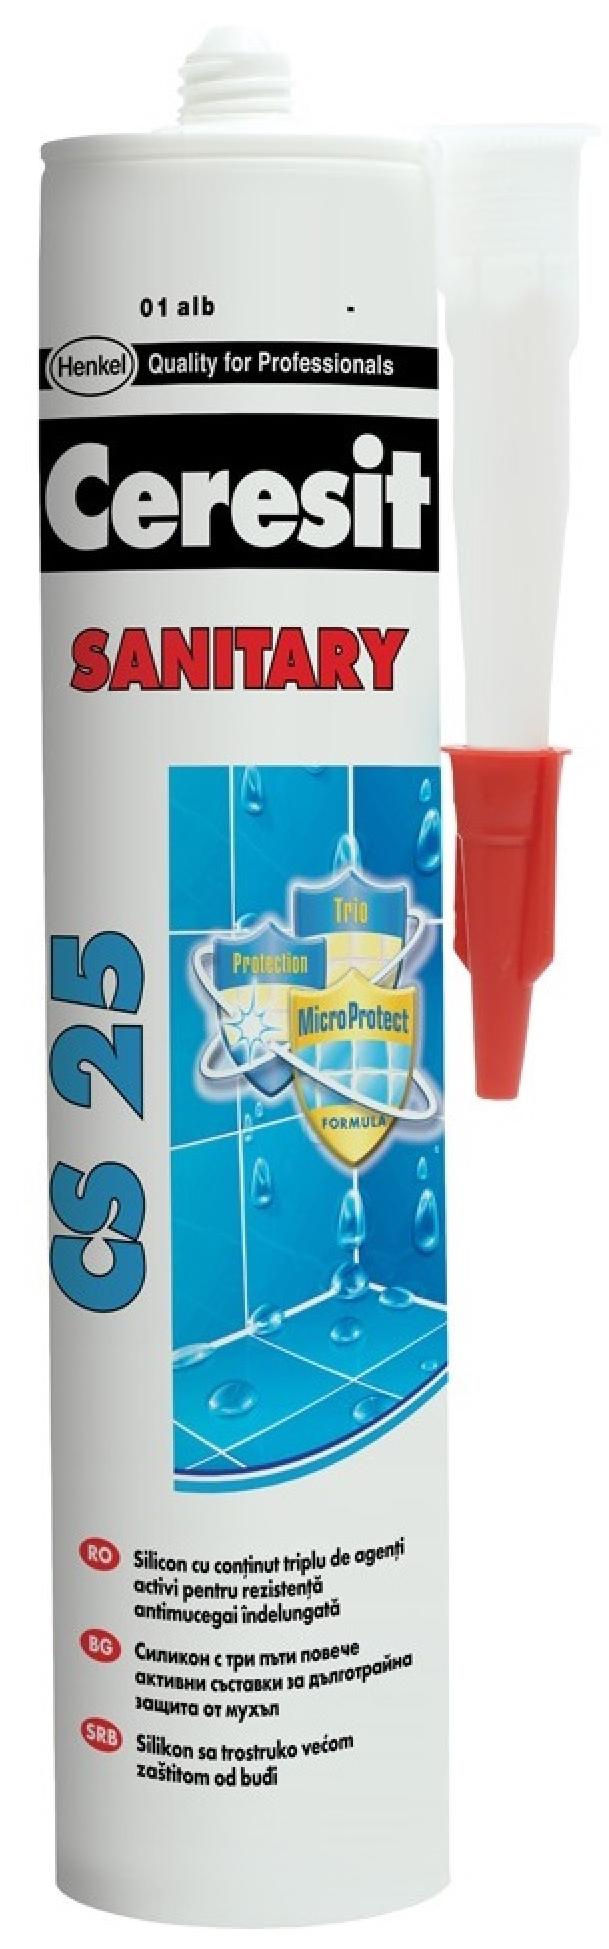 Ceresit CS 25 43, 280 мл, Затирка-герметик санитарная, Багамы